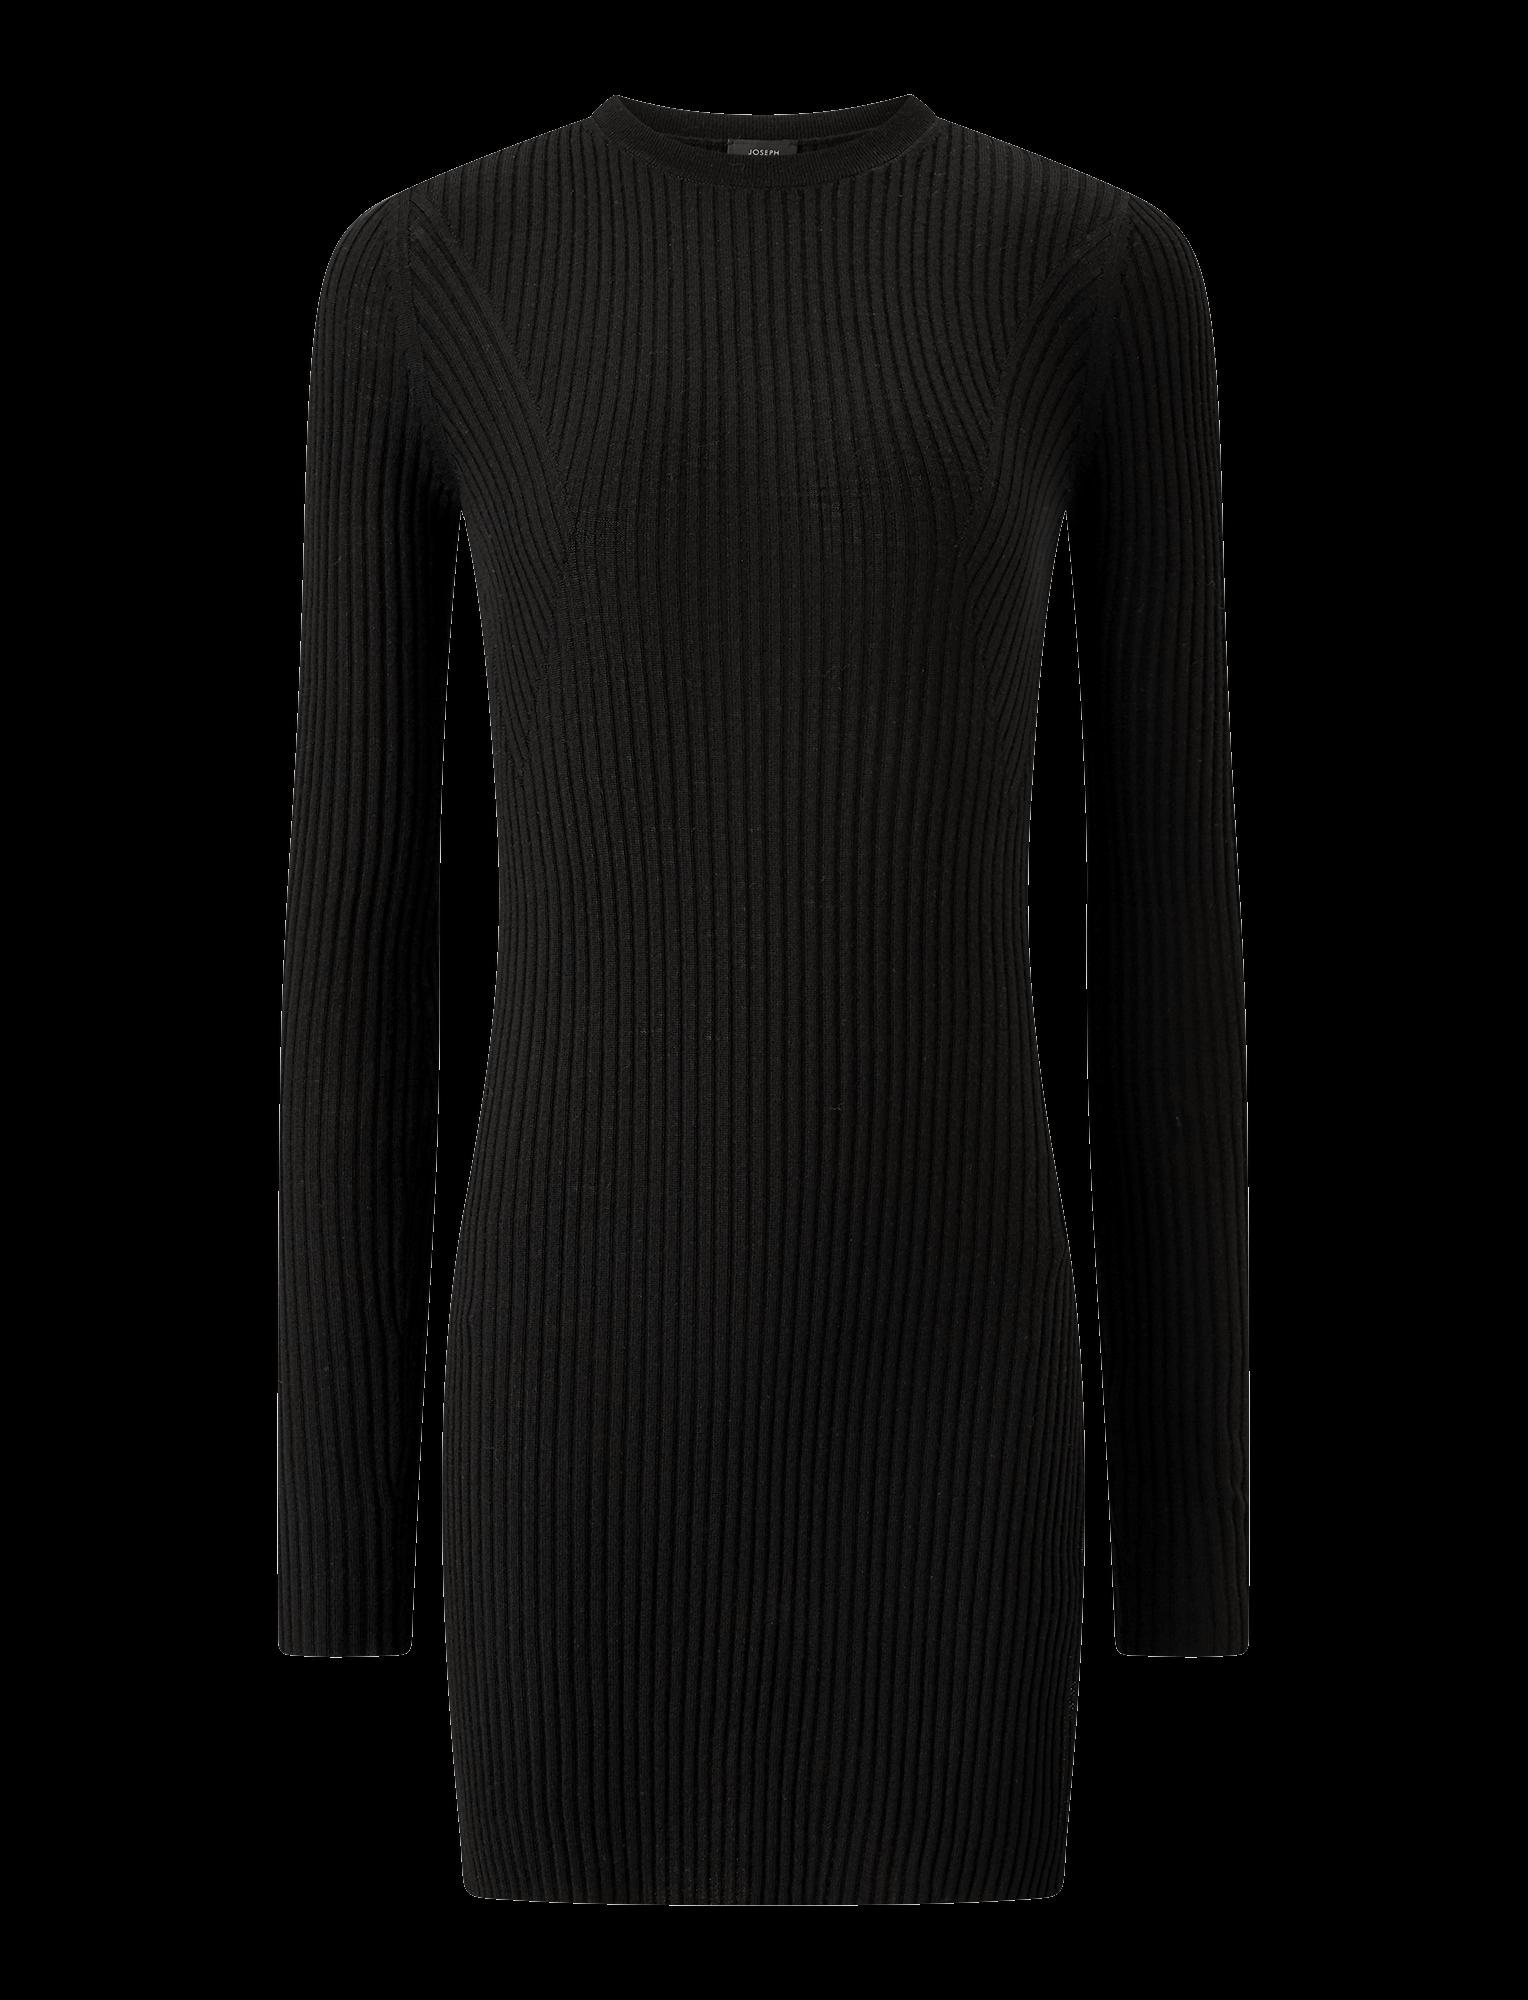 Joseph, Tunic Light Merinos Rib Knit, in BLACK